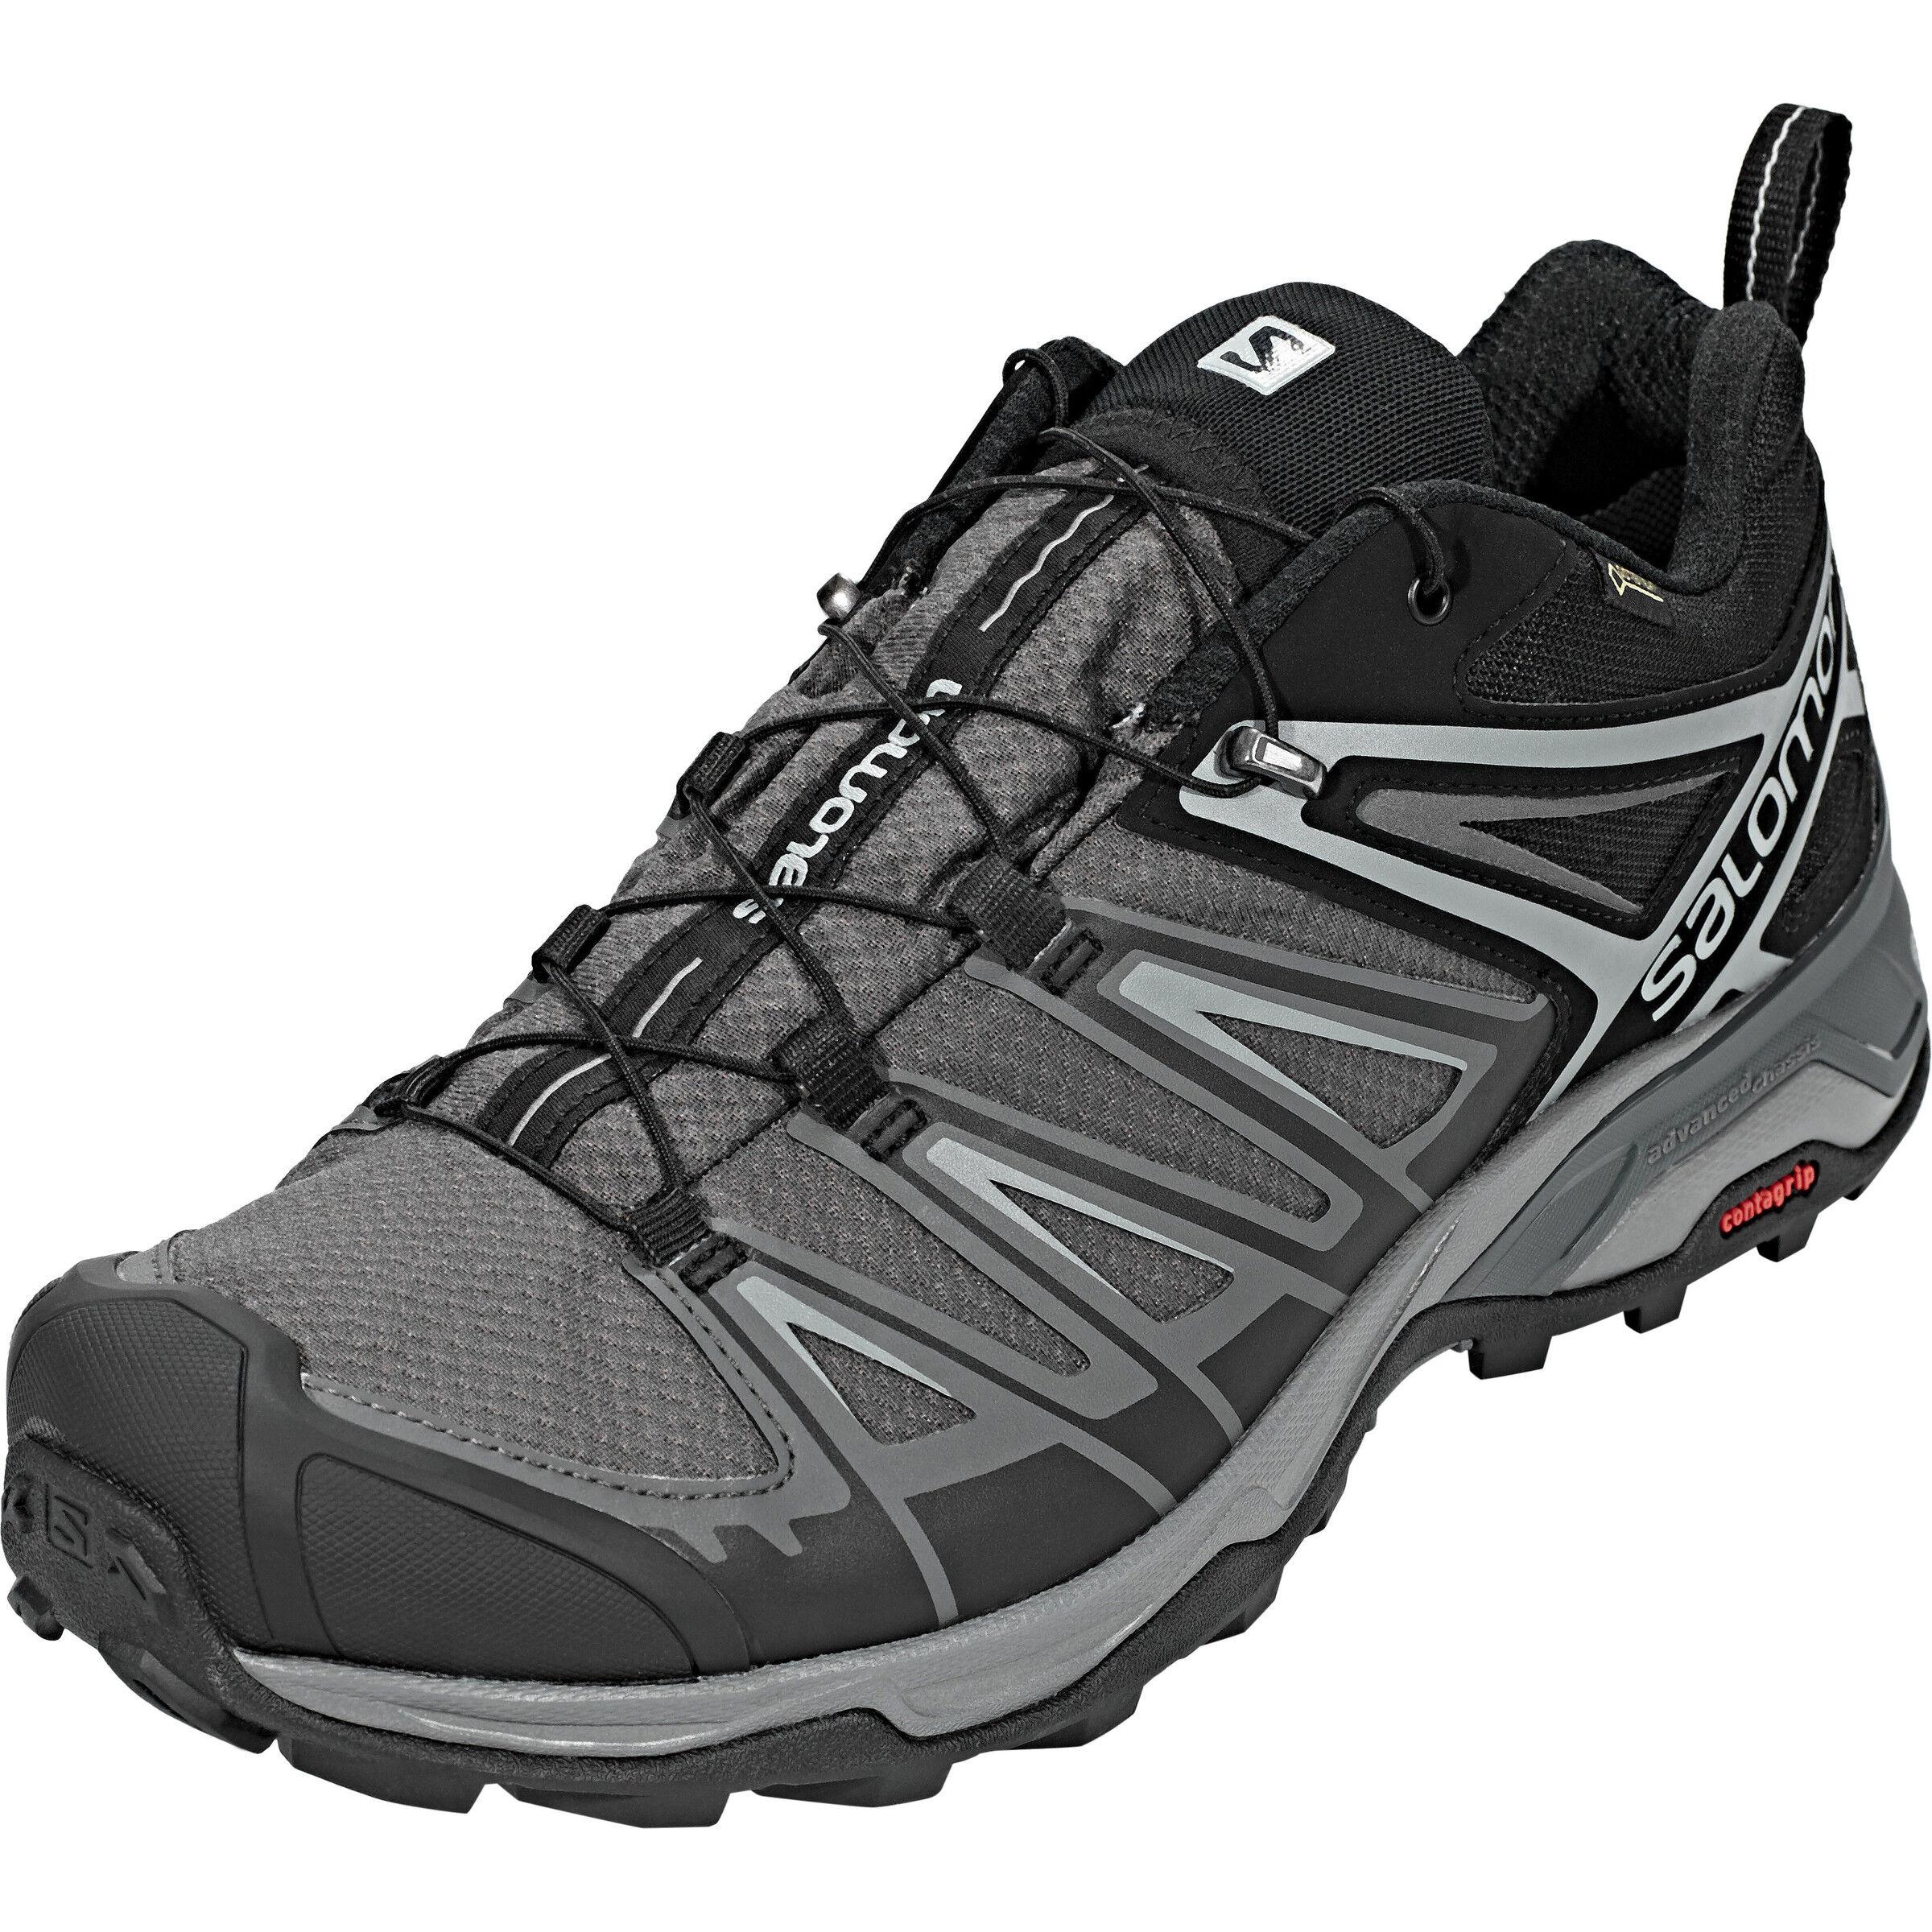 salomon manila mid gtx hiking & trekking shoes | Becky